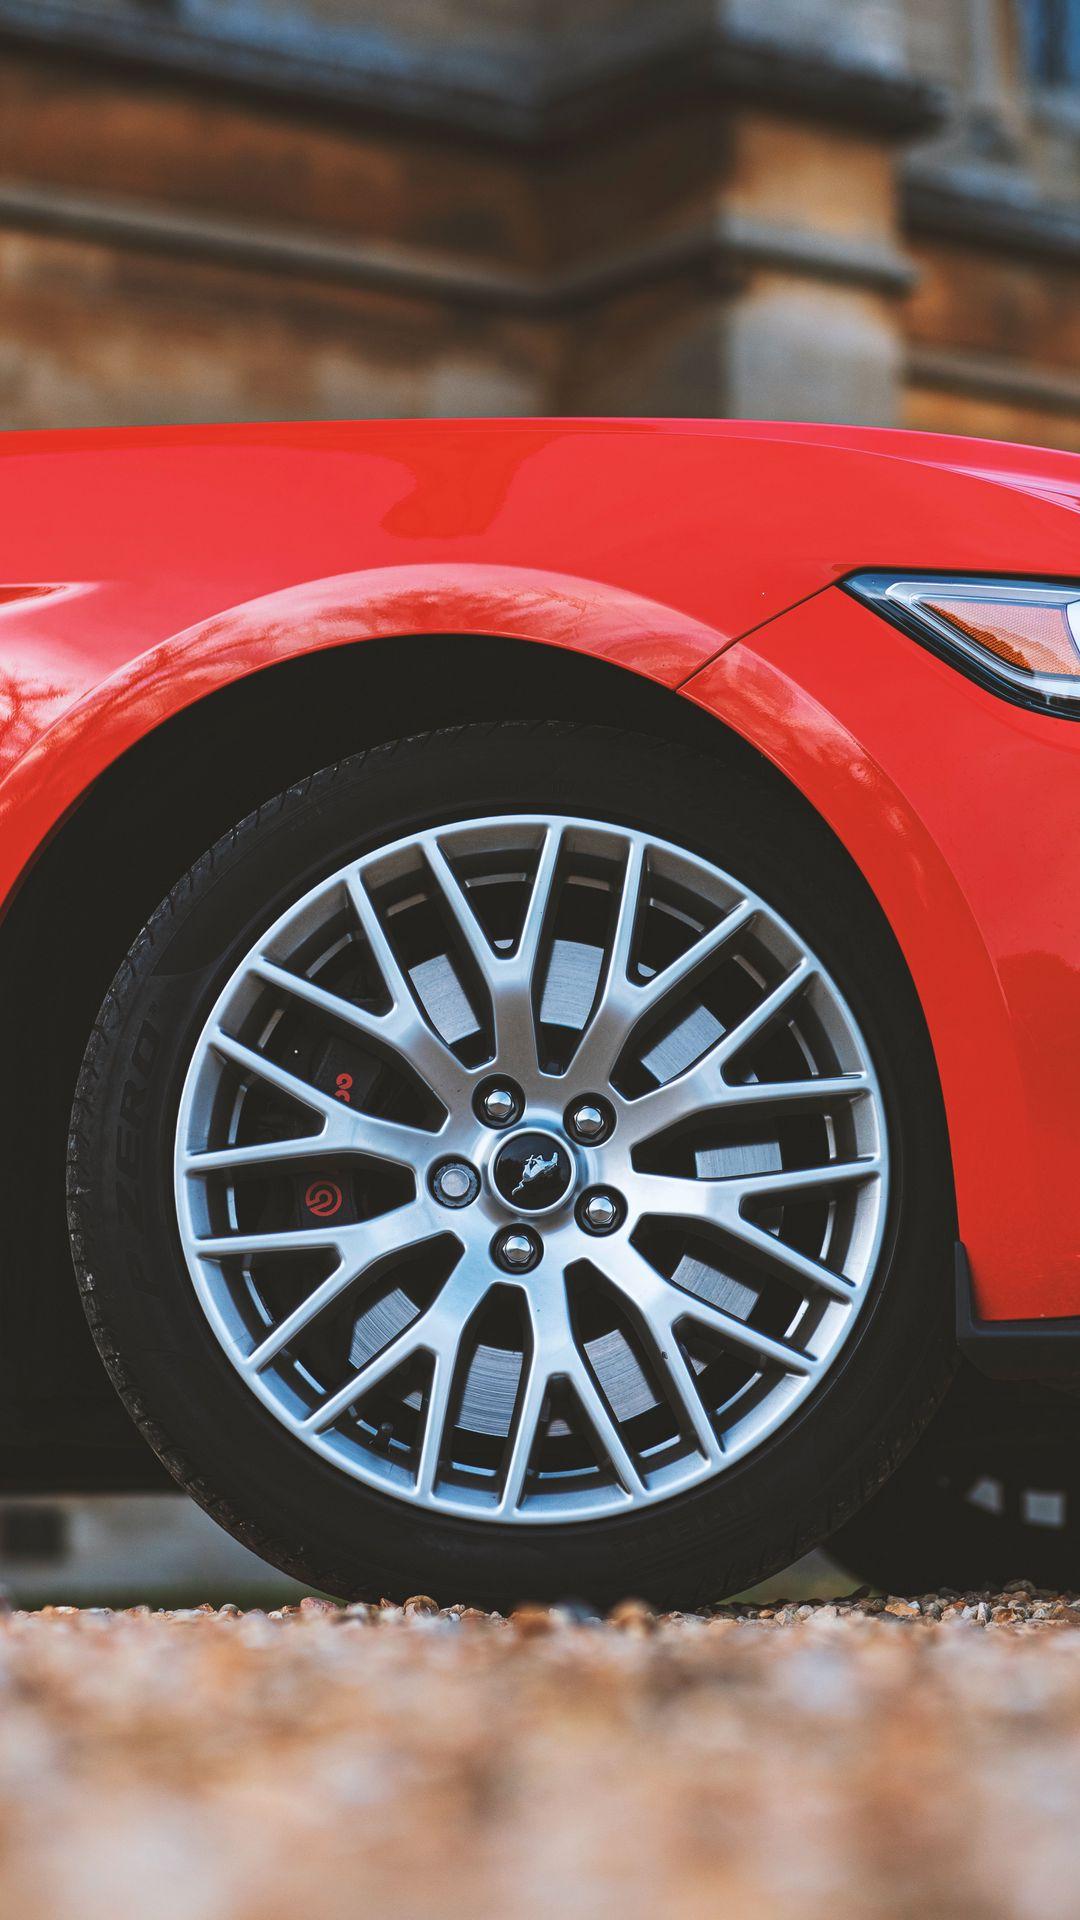 Ferrari Wheel Wallpapers Free Download